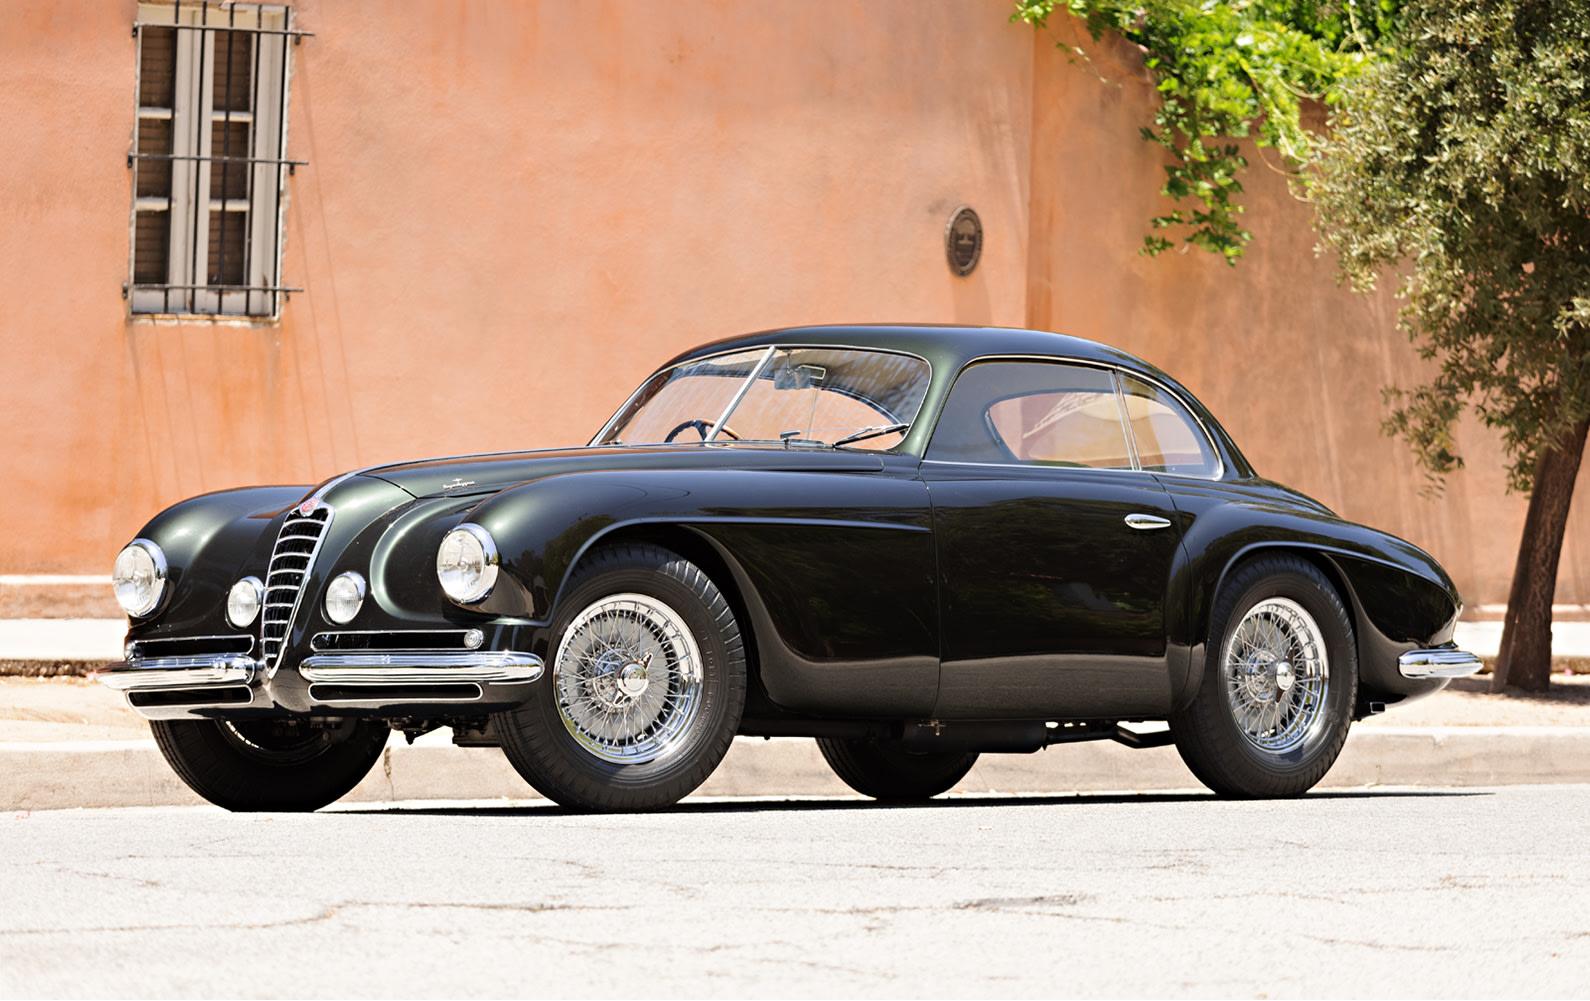 Prod/PB21 - Pebble Beach Auctions 2021/631 — 1949 Alfa Romeo 6C 2500 Villa d'Este/1949_Alfa_Romeo_6C_2500_Villa_d_Este_13_w0lf2f